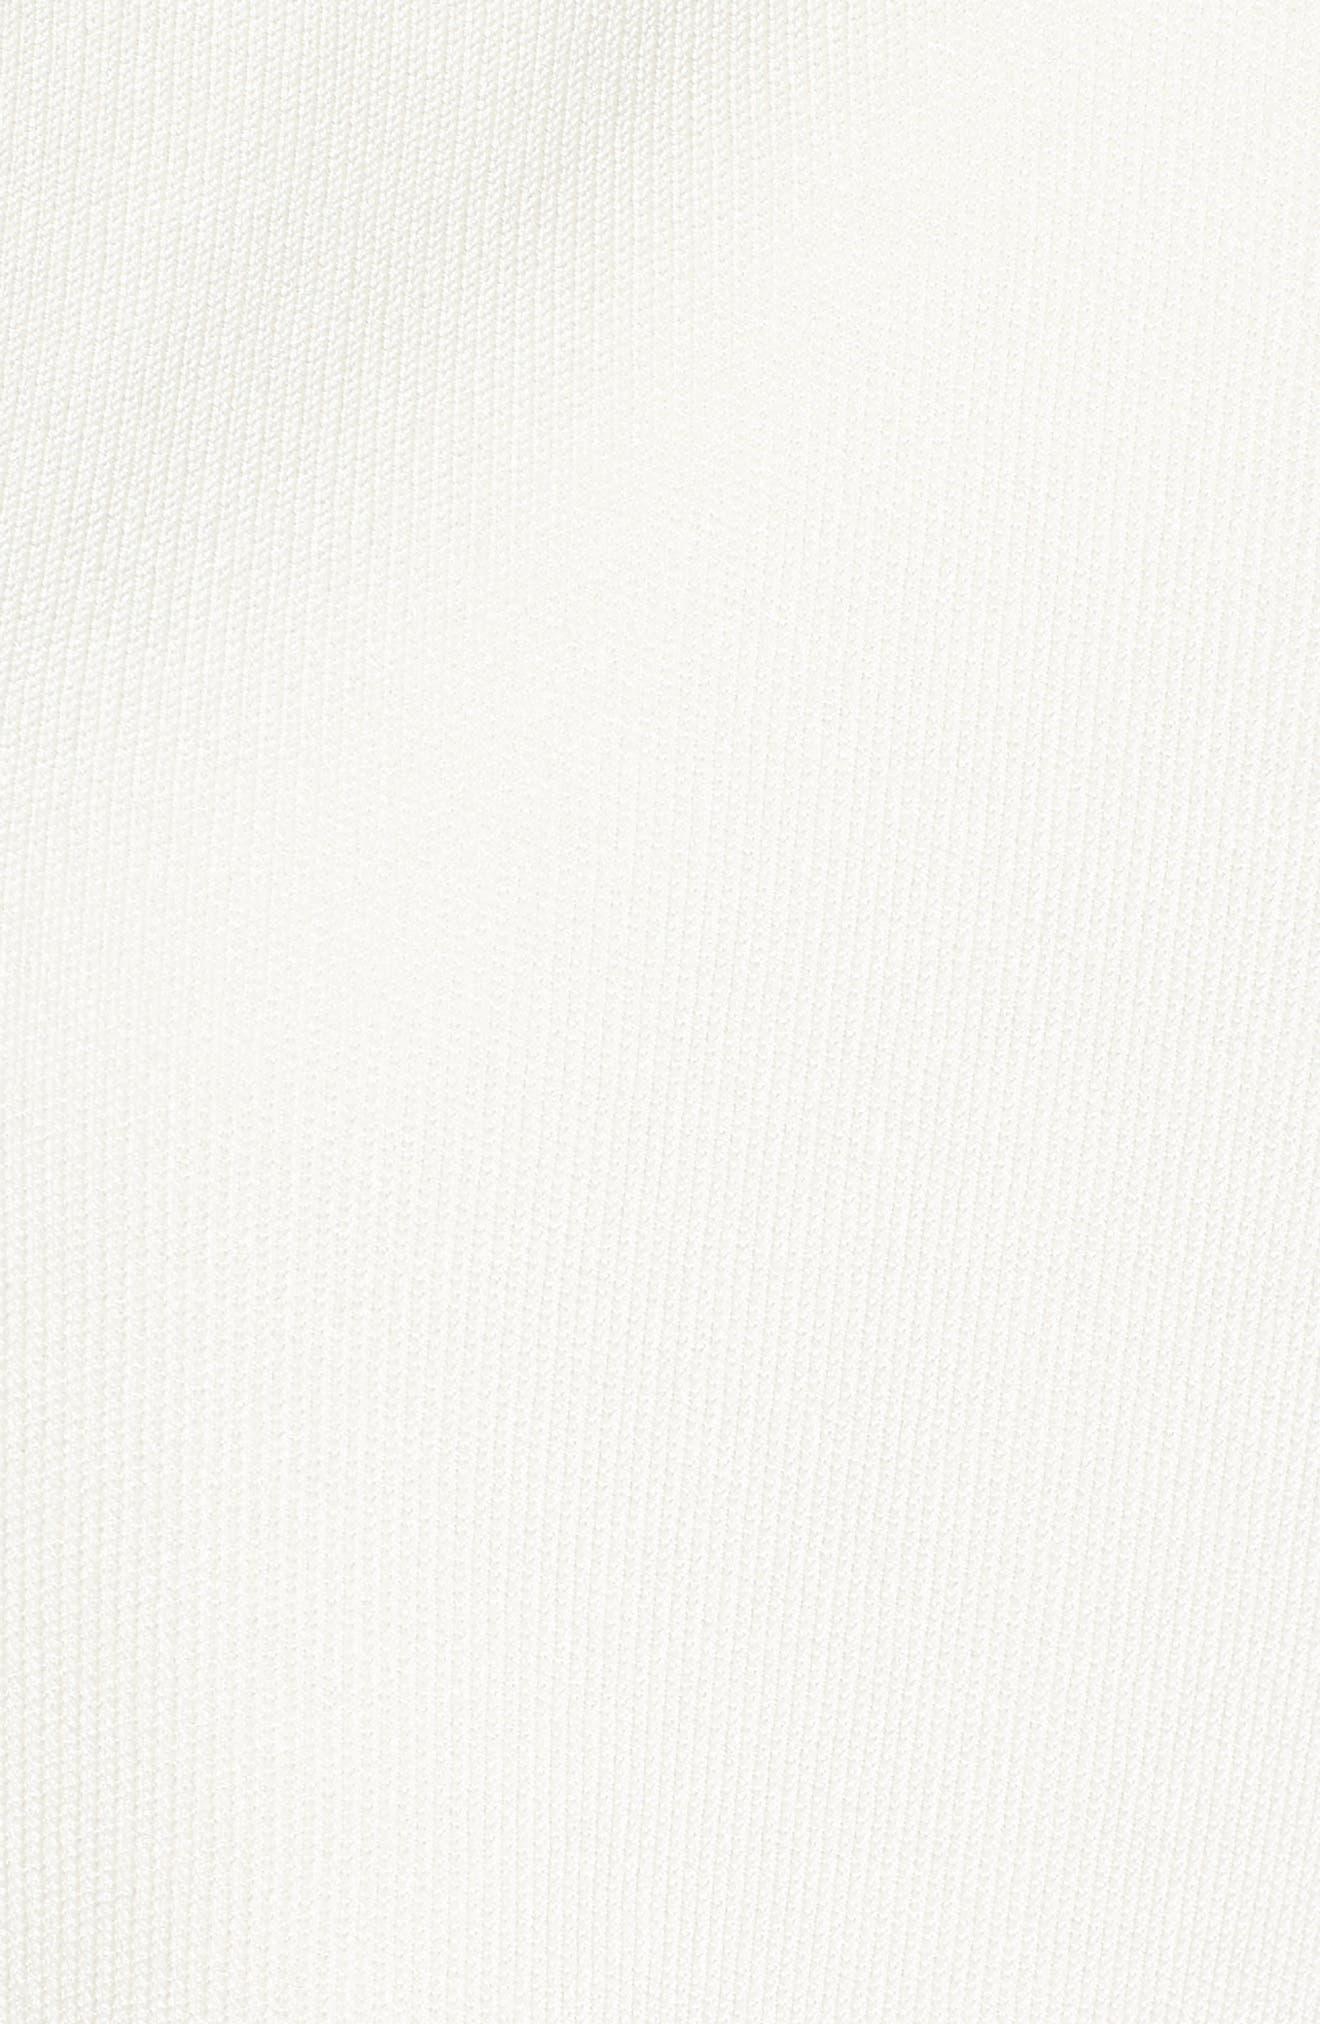 Fatilde Crop Cardigan,                             Alternate thumbnail 6, color,                             White